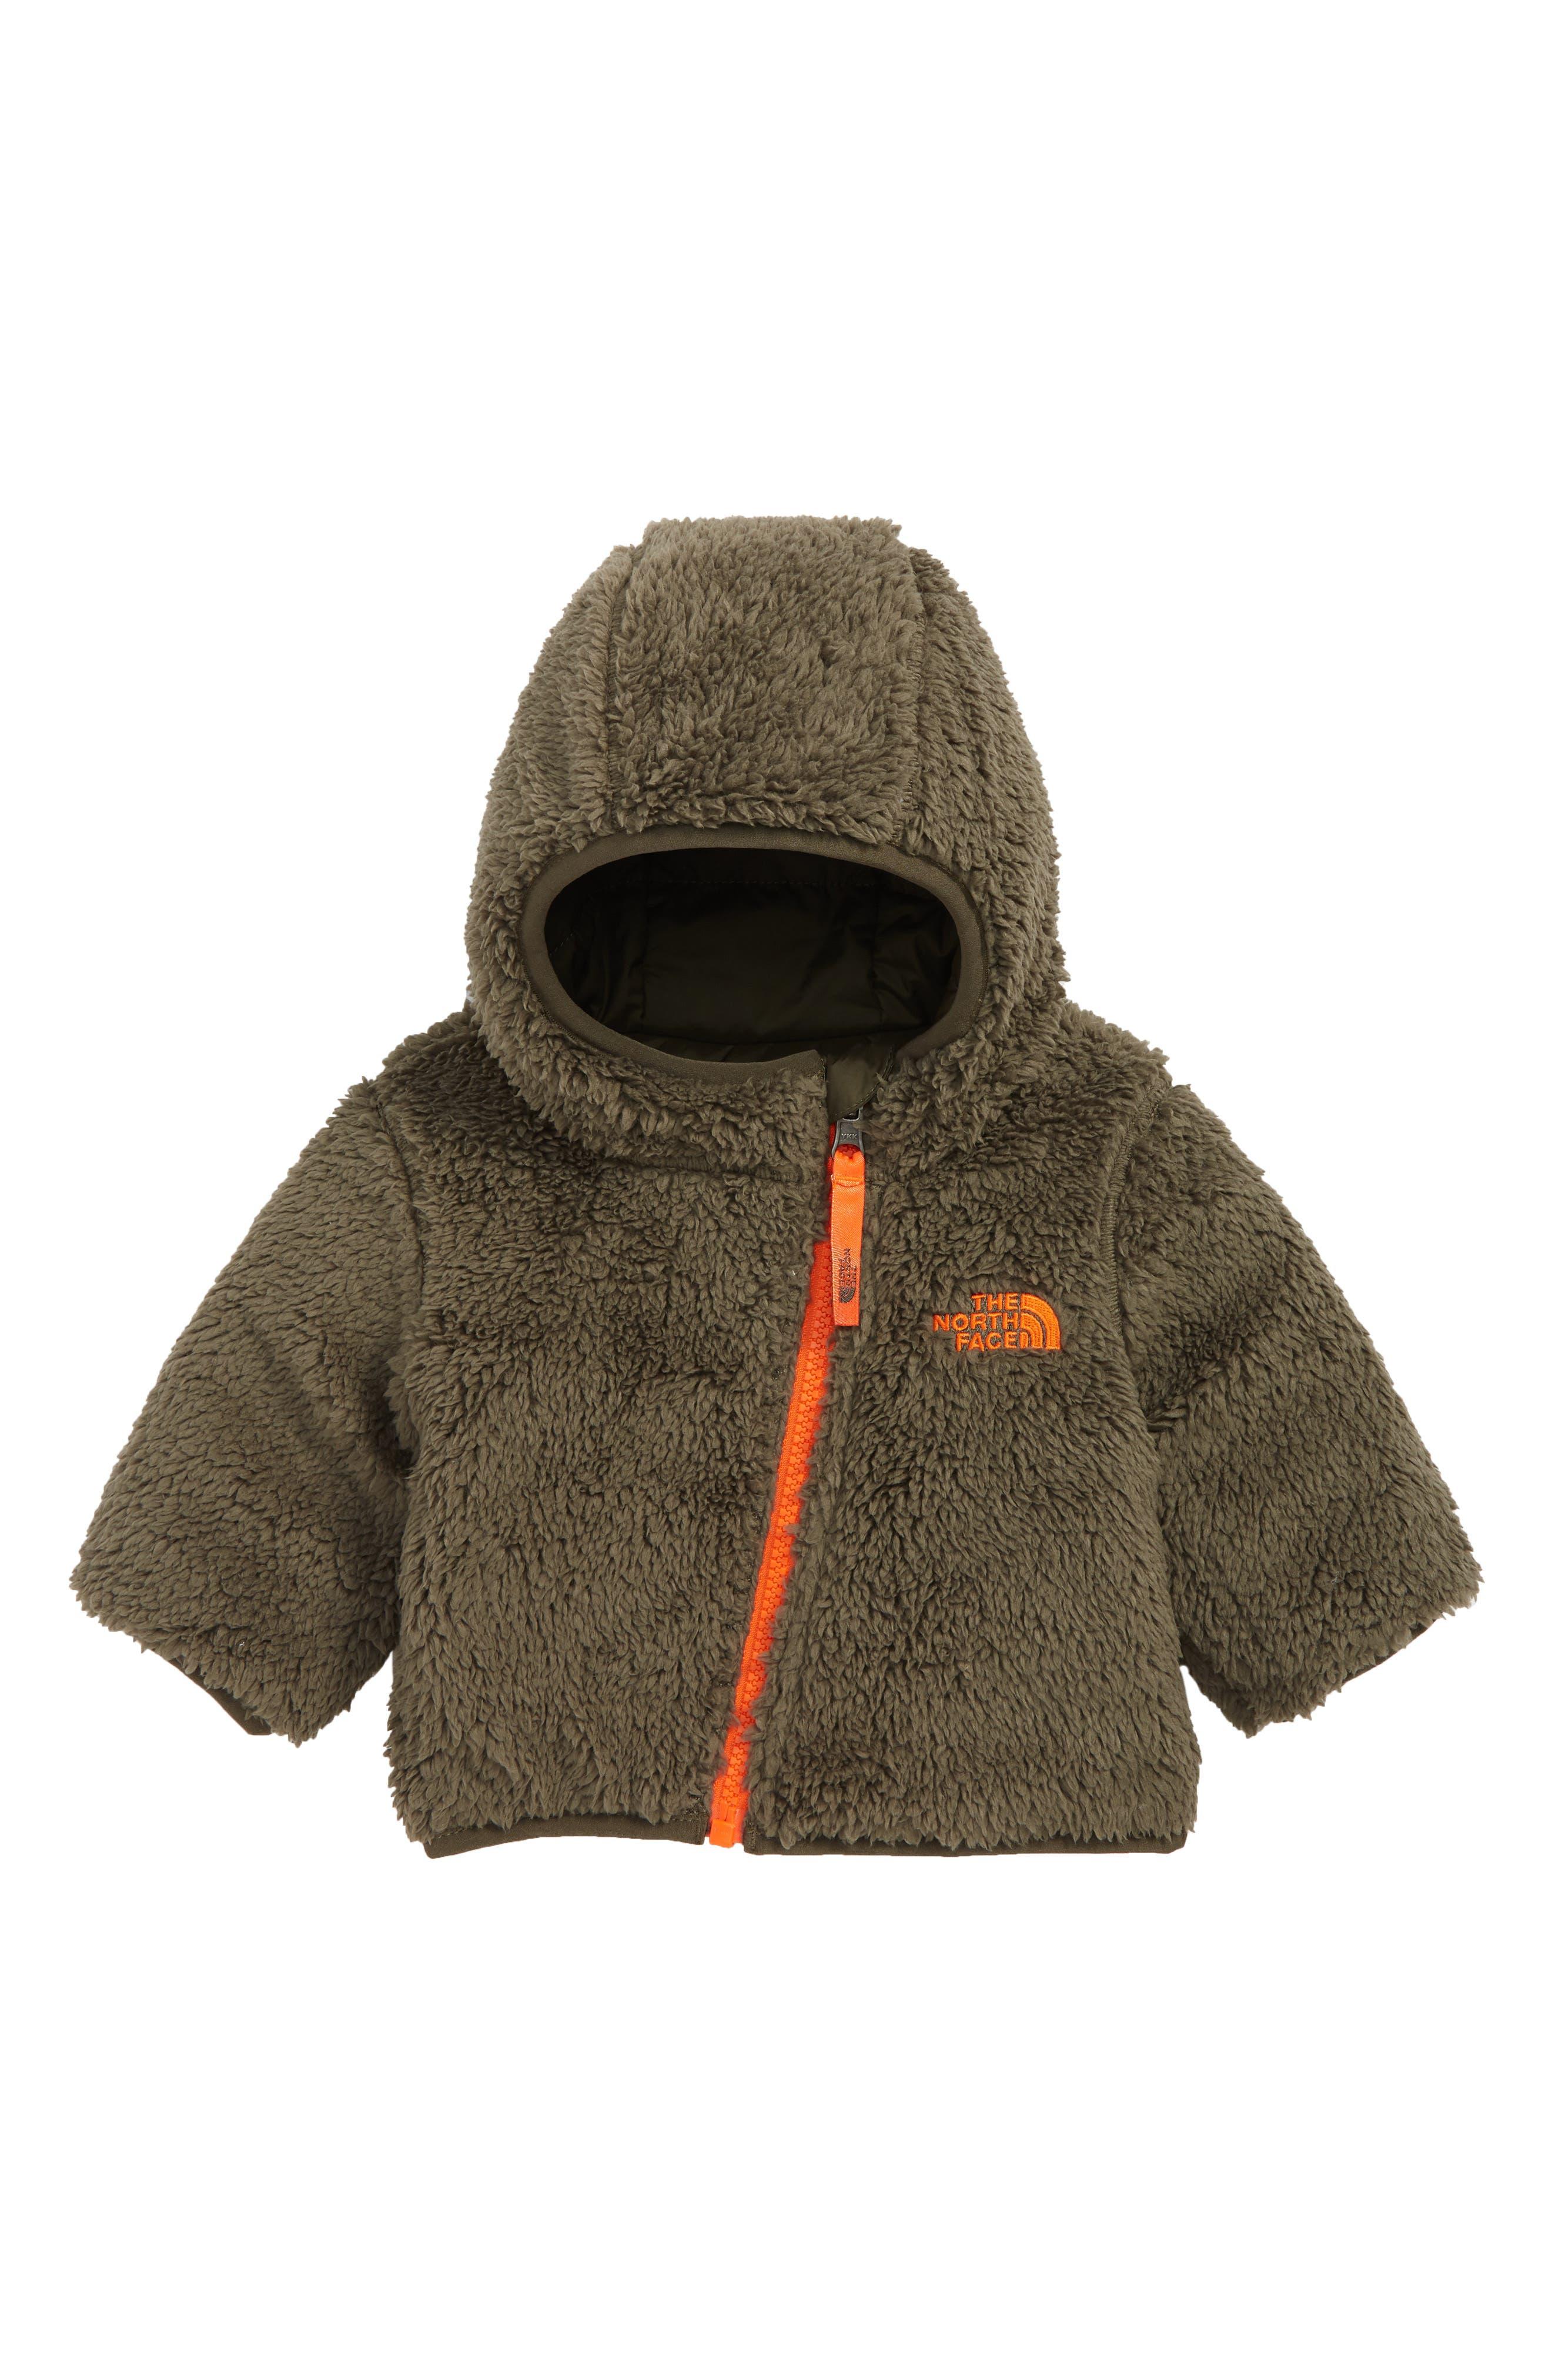 Mount Chimborazo Reversible Jacket,                             Alternate thumbnail 2, color,                             TAUPE/ GREEN CAMO PRINT